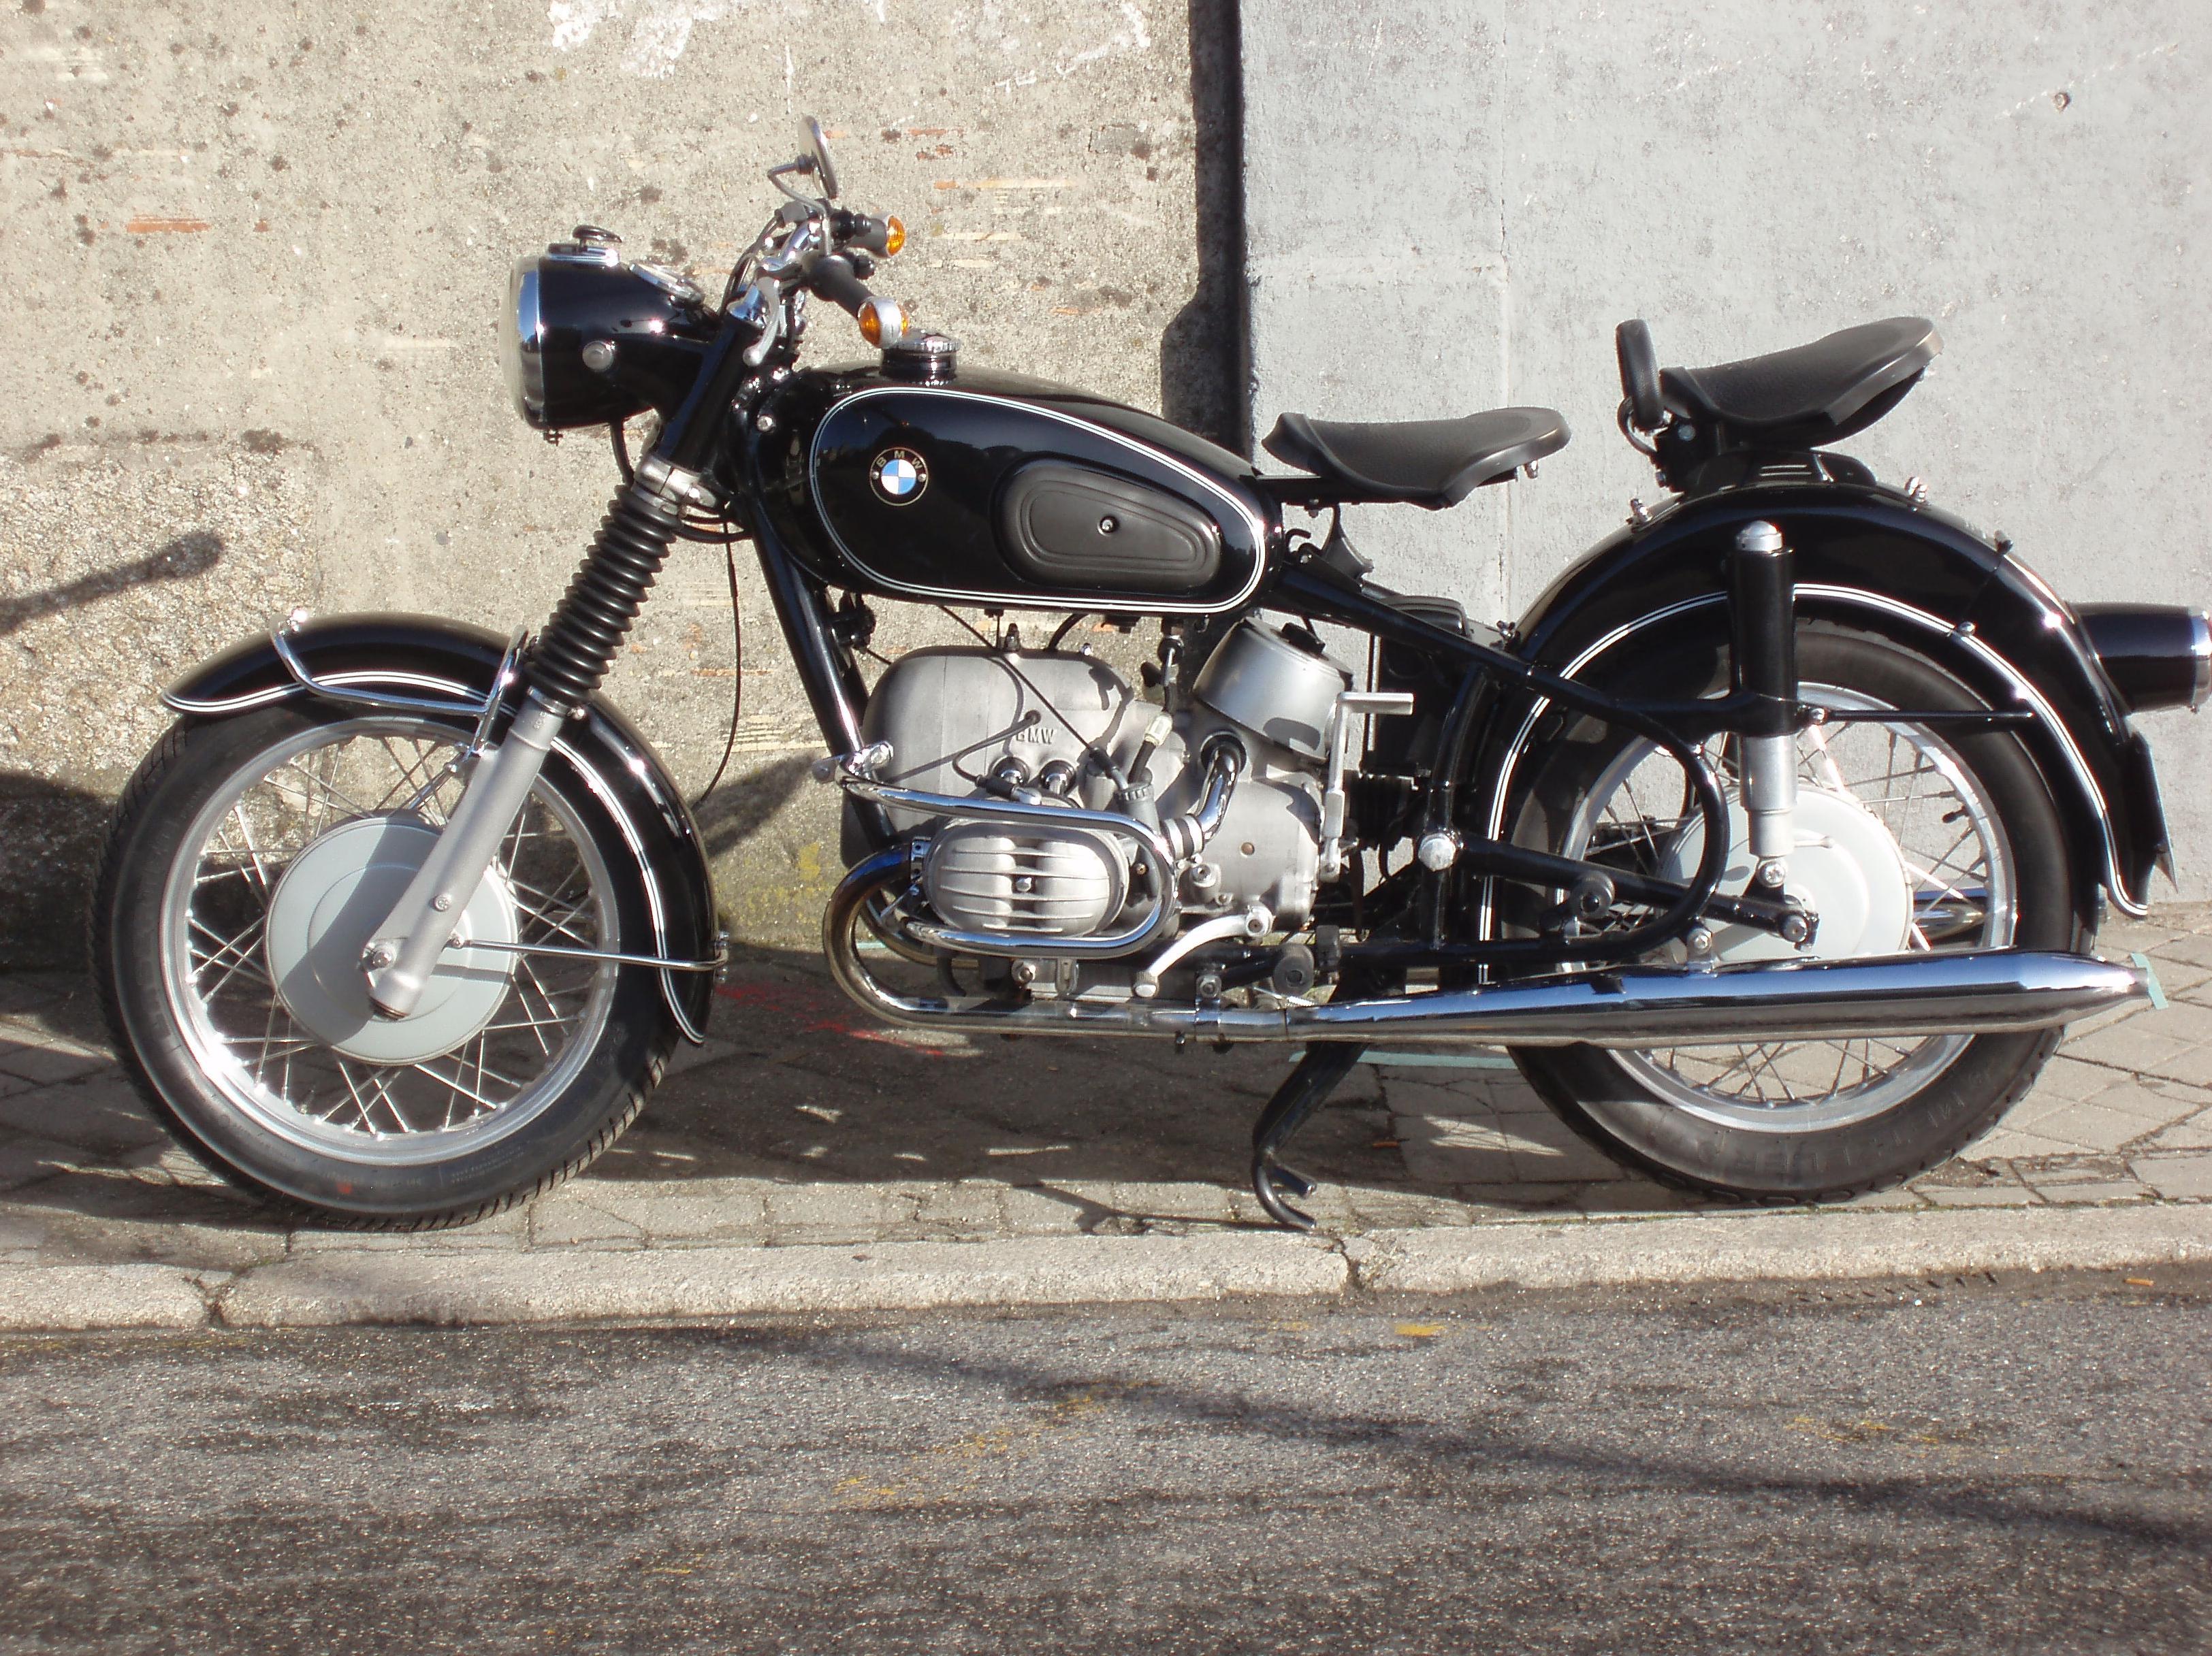 Foto 24 de Motos en Vigo | Moto 2